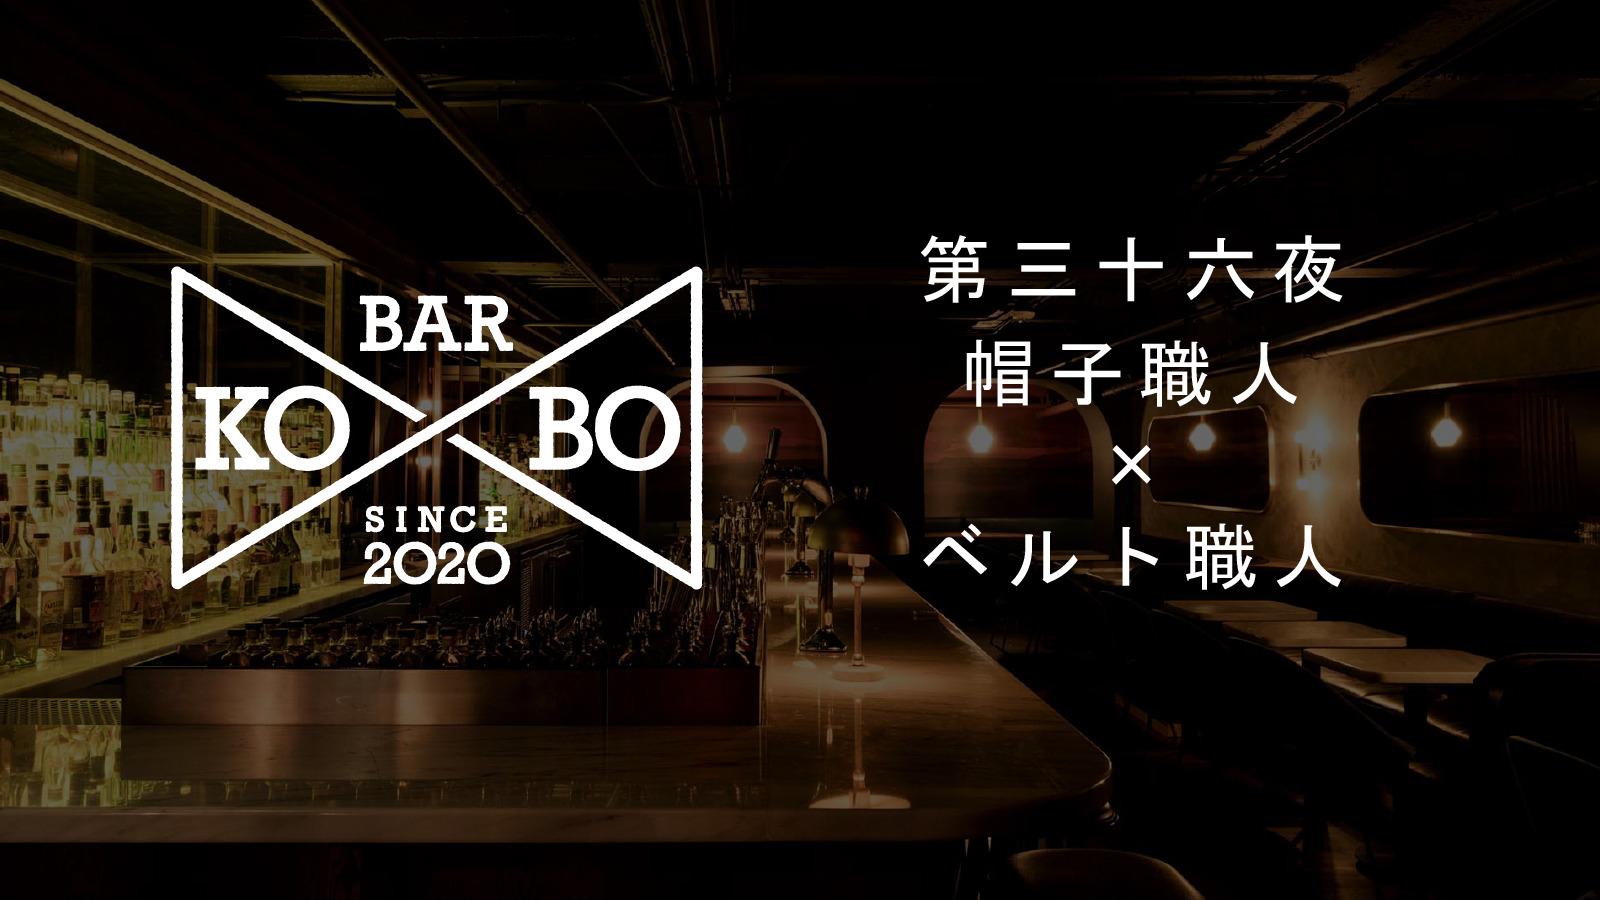 【Bar KO-BO 第三十六夜】帽子職人×ベルト職人